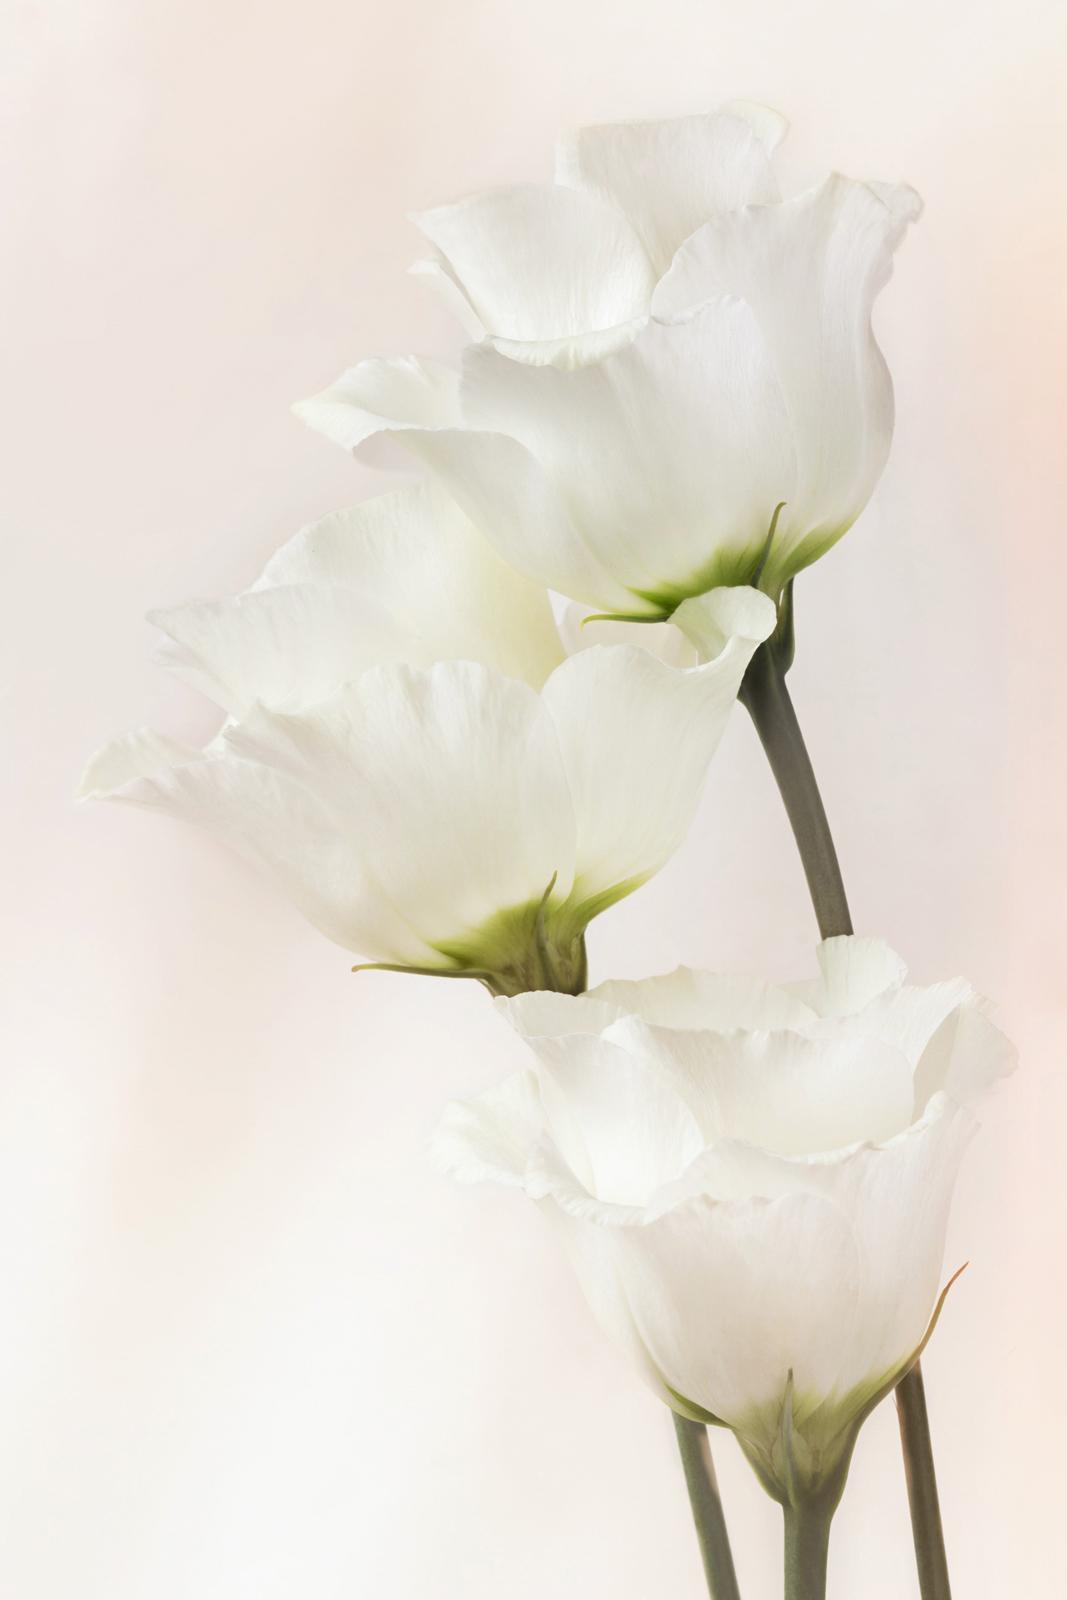 Softly,softly/ Rose without thorns